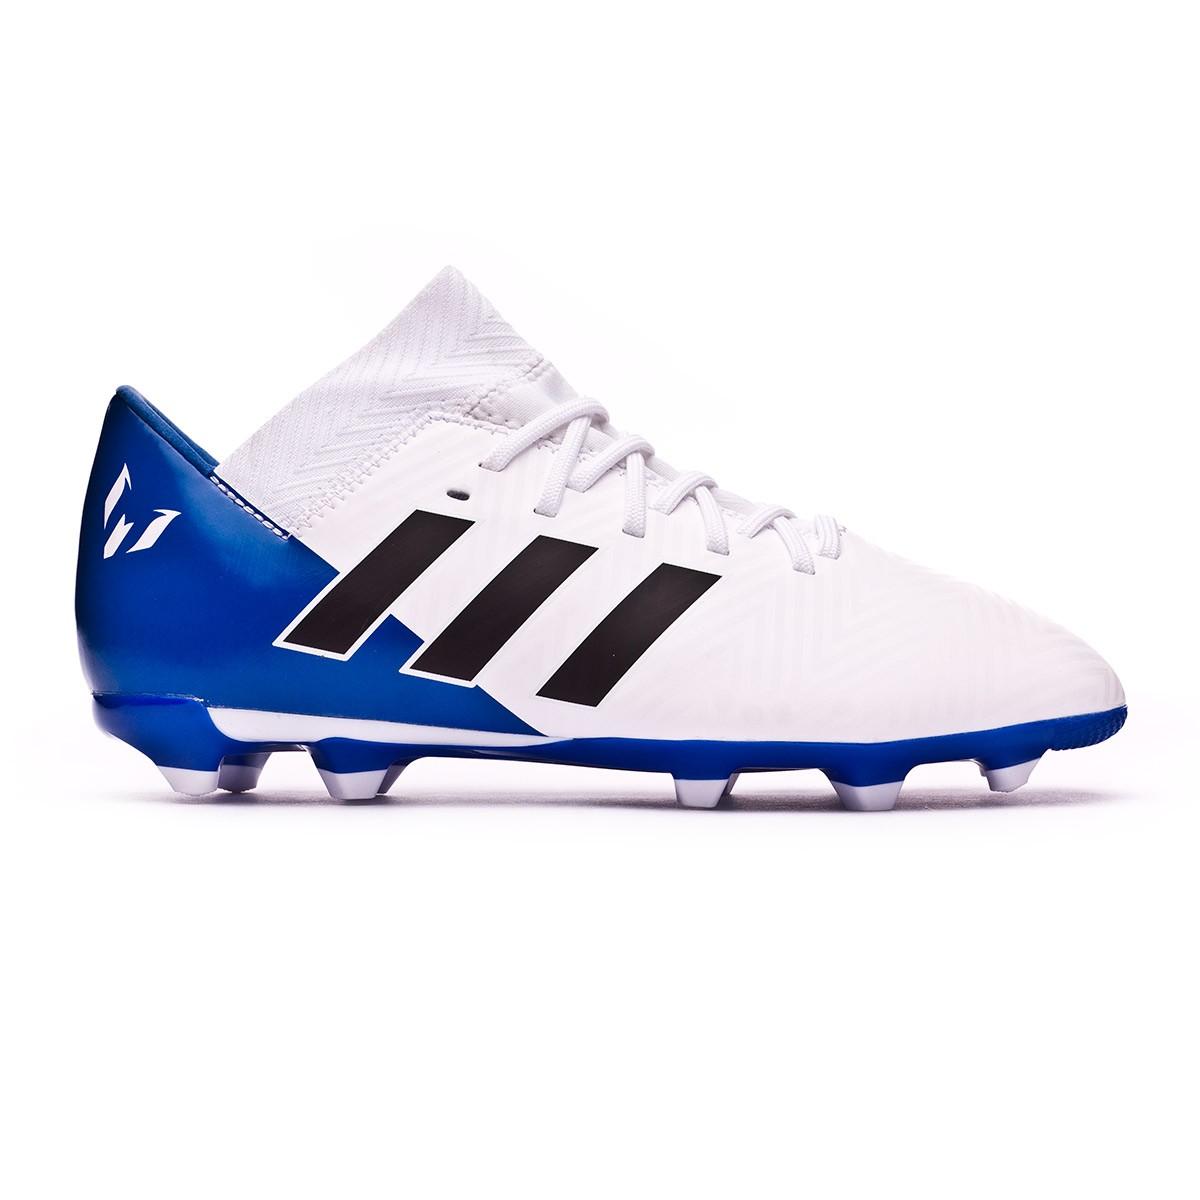 dd0ba906ef83 Boot adidas Kids Nemeziz Messi 18.3 FG White-Core black-Football blue Niño  - Leaked soccer